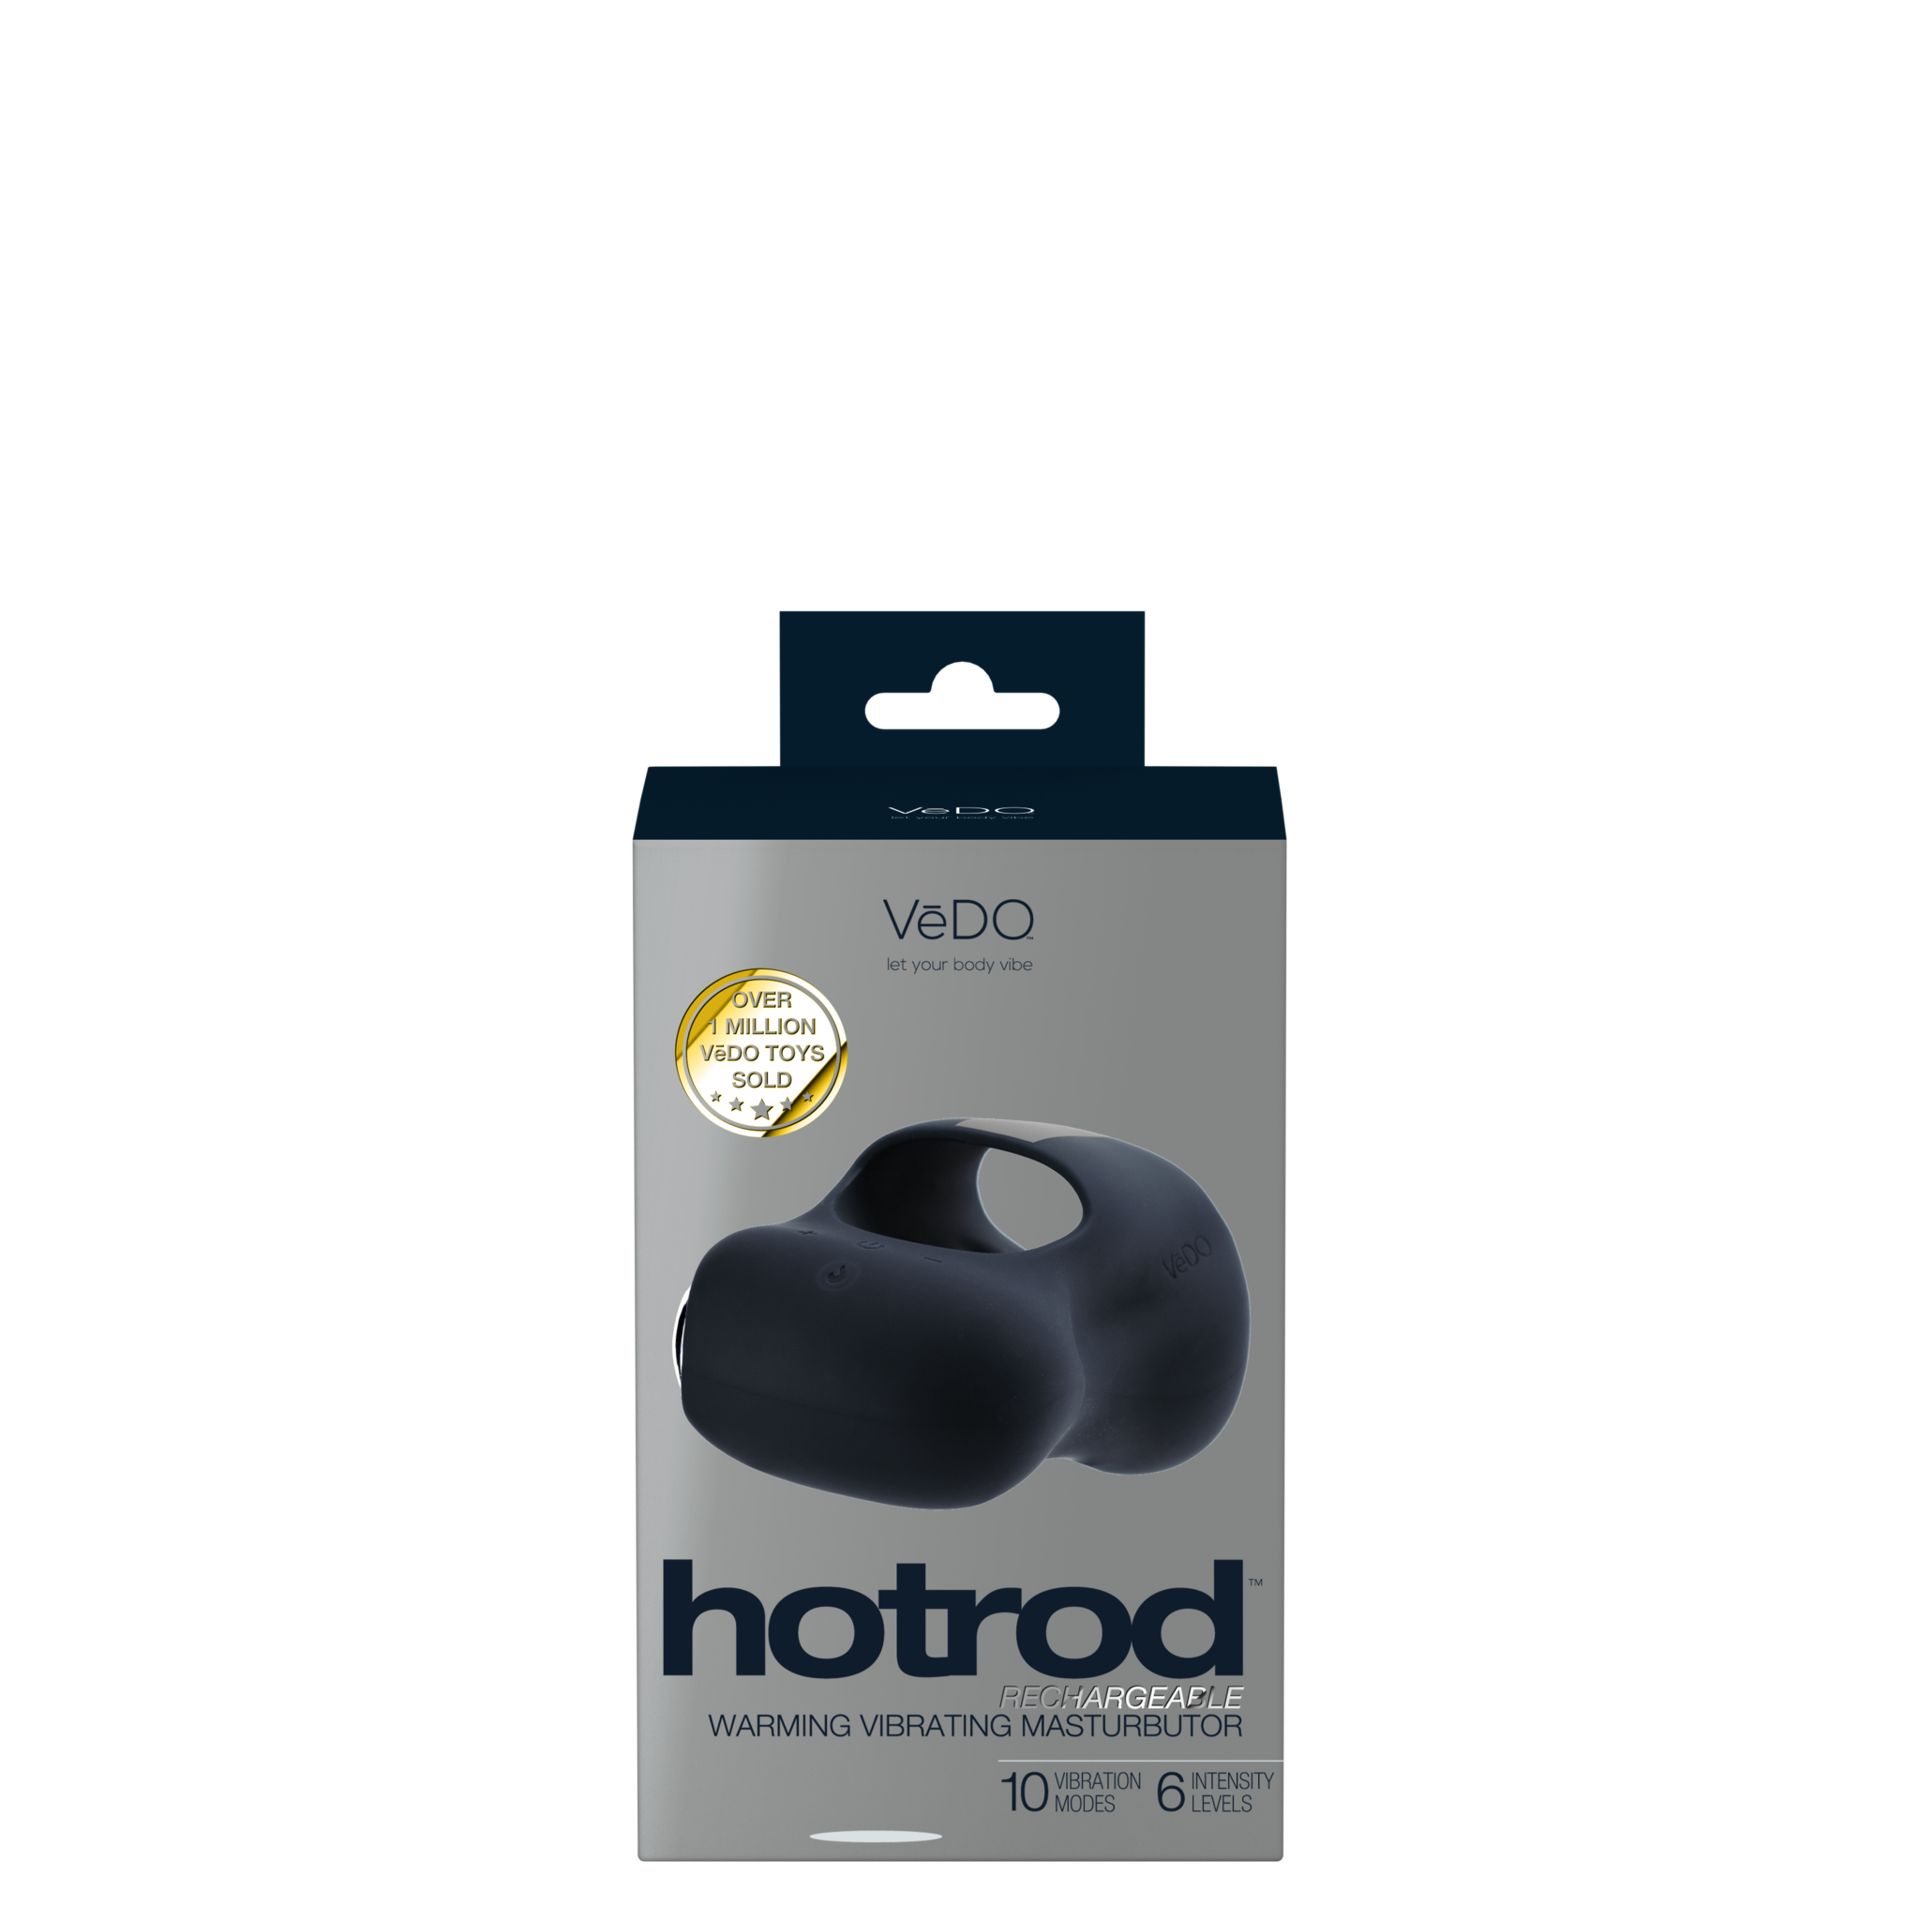 Image de Hot Rod Rechargeable Warming Stroker- Black- Vedo